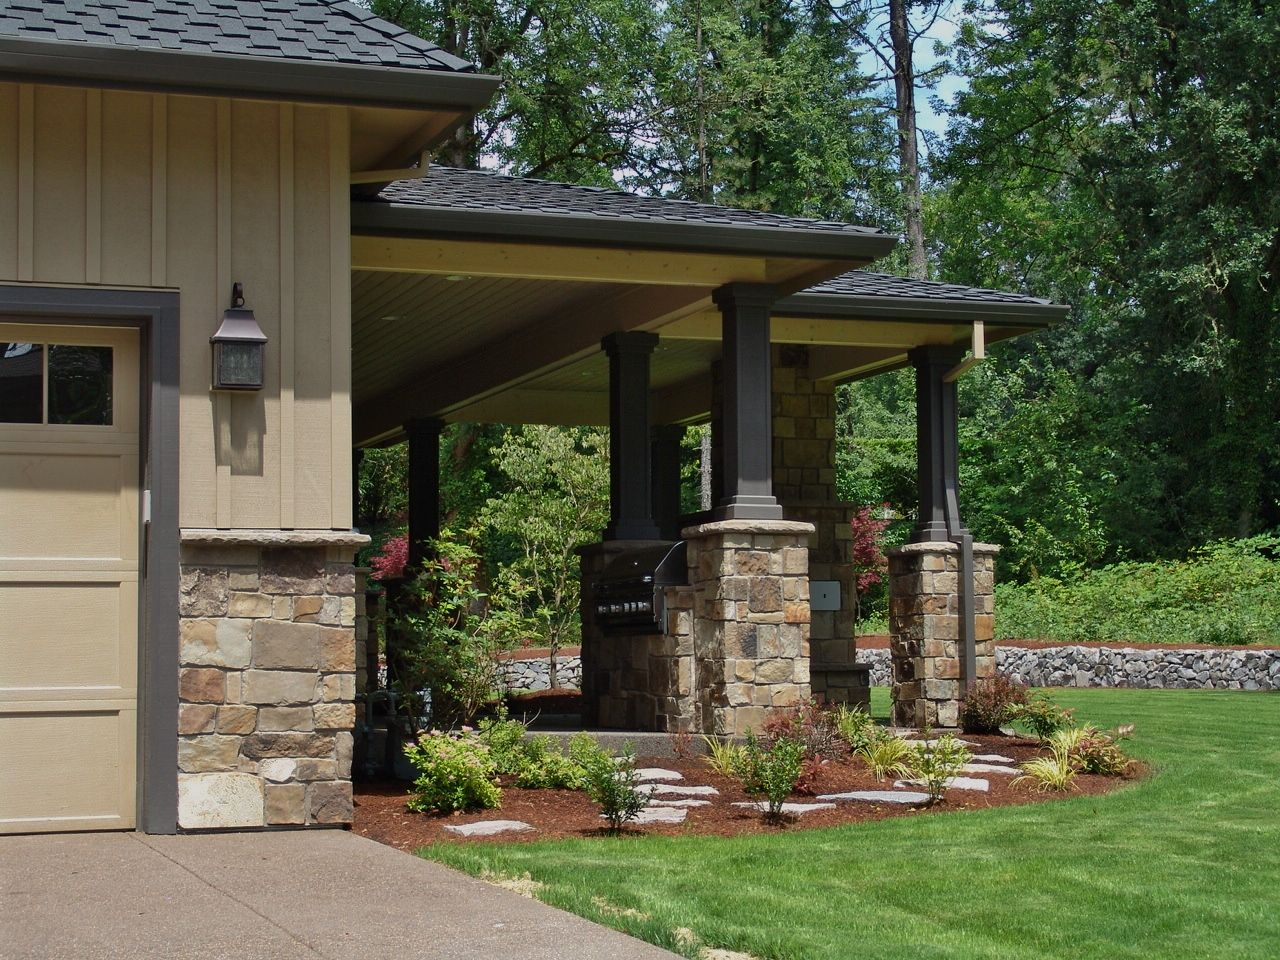 natural stone veneer  stone around garage  wainscot  outdoor living  outdoor fireplace  stone